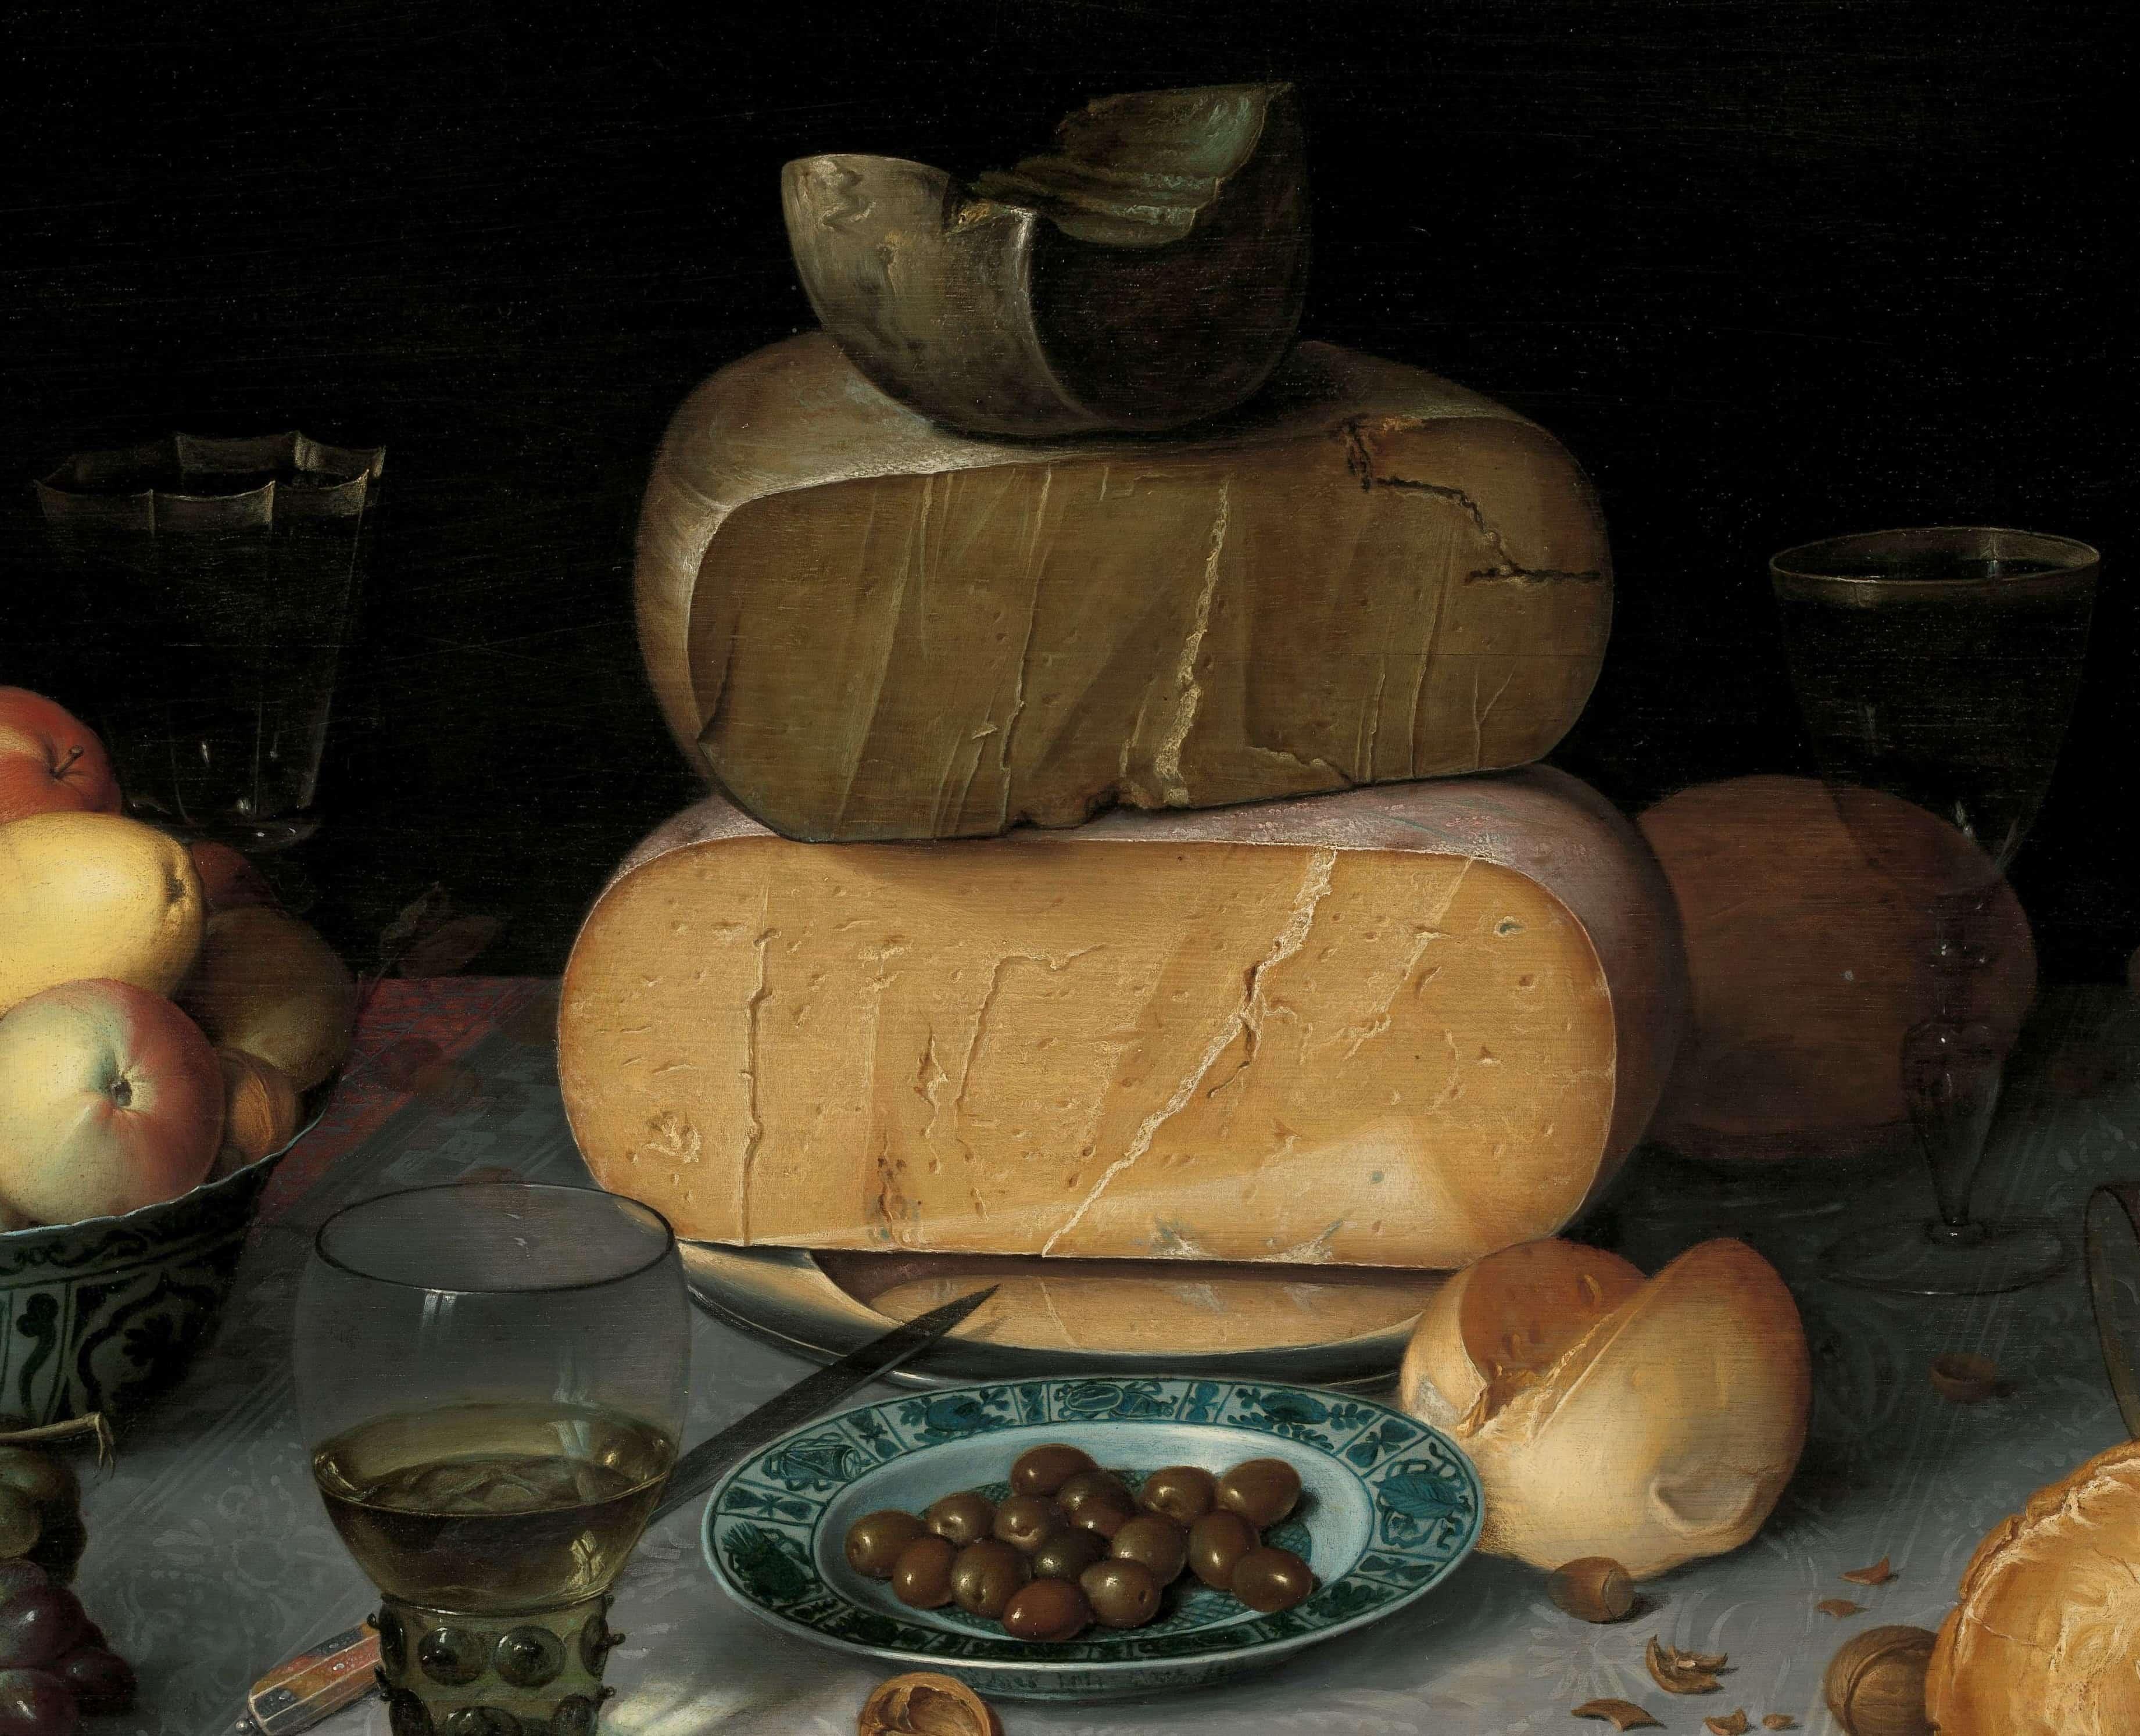 ´¡Pa-ta-ta!´, Un retrato de quesos holandeses en el siglo XVII